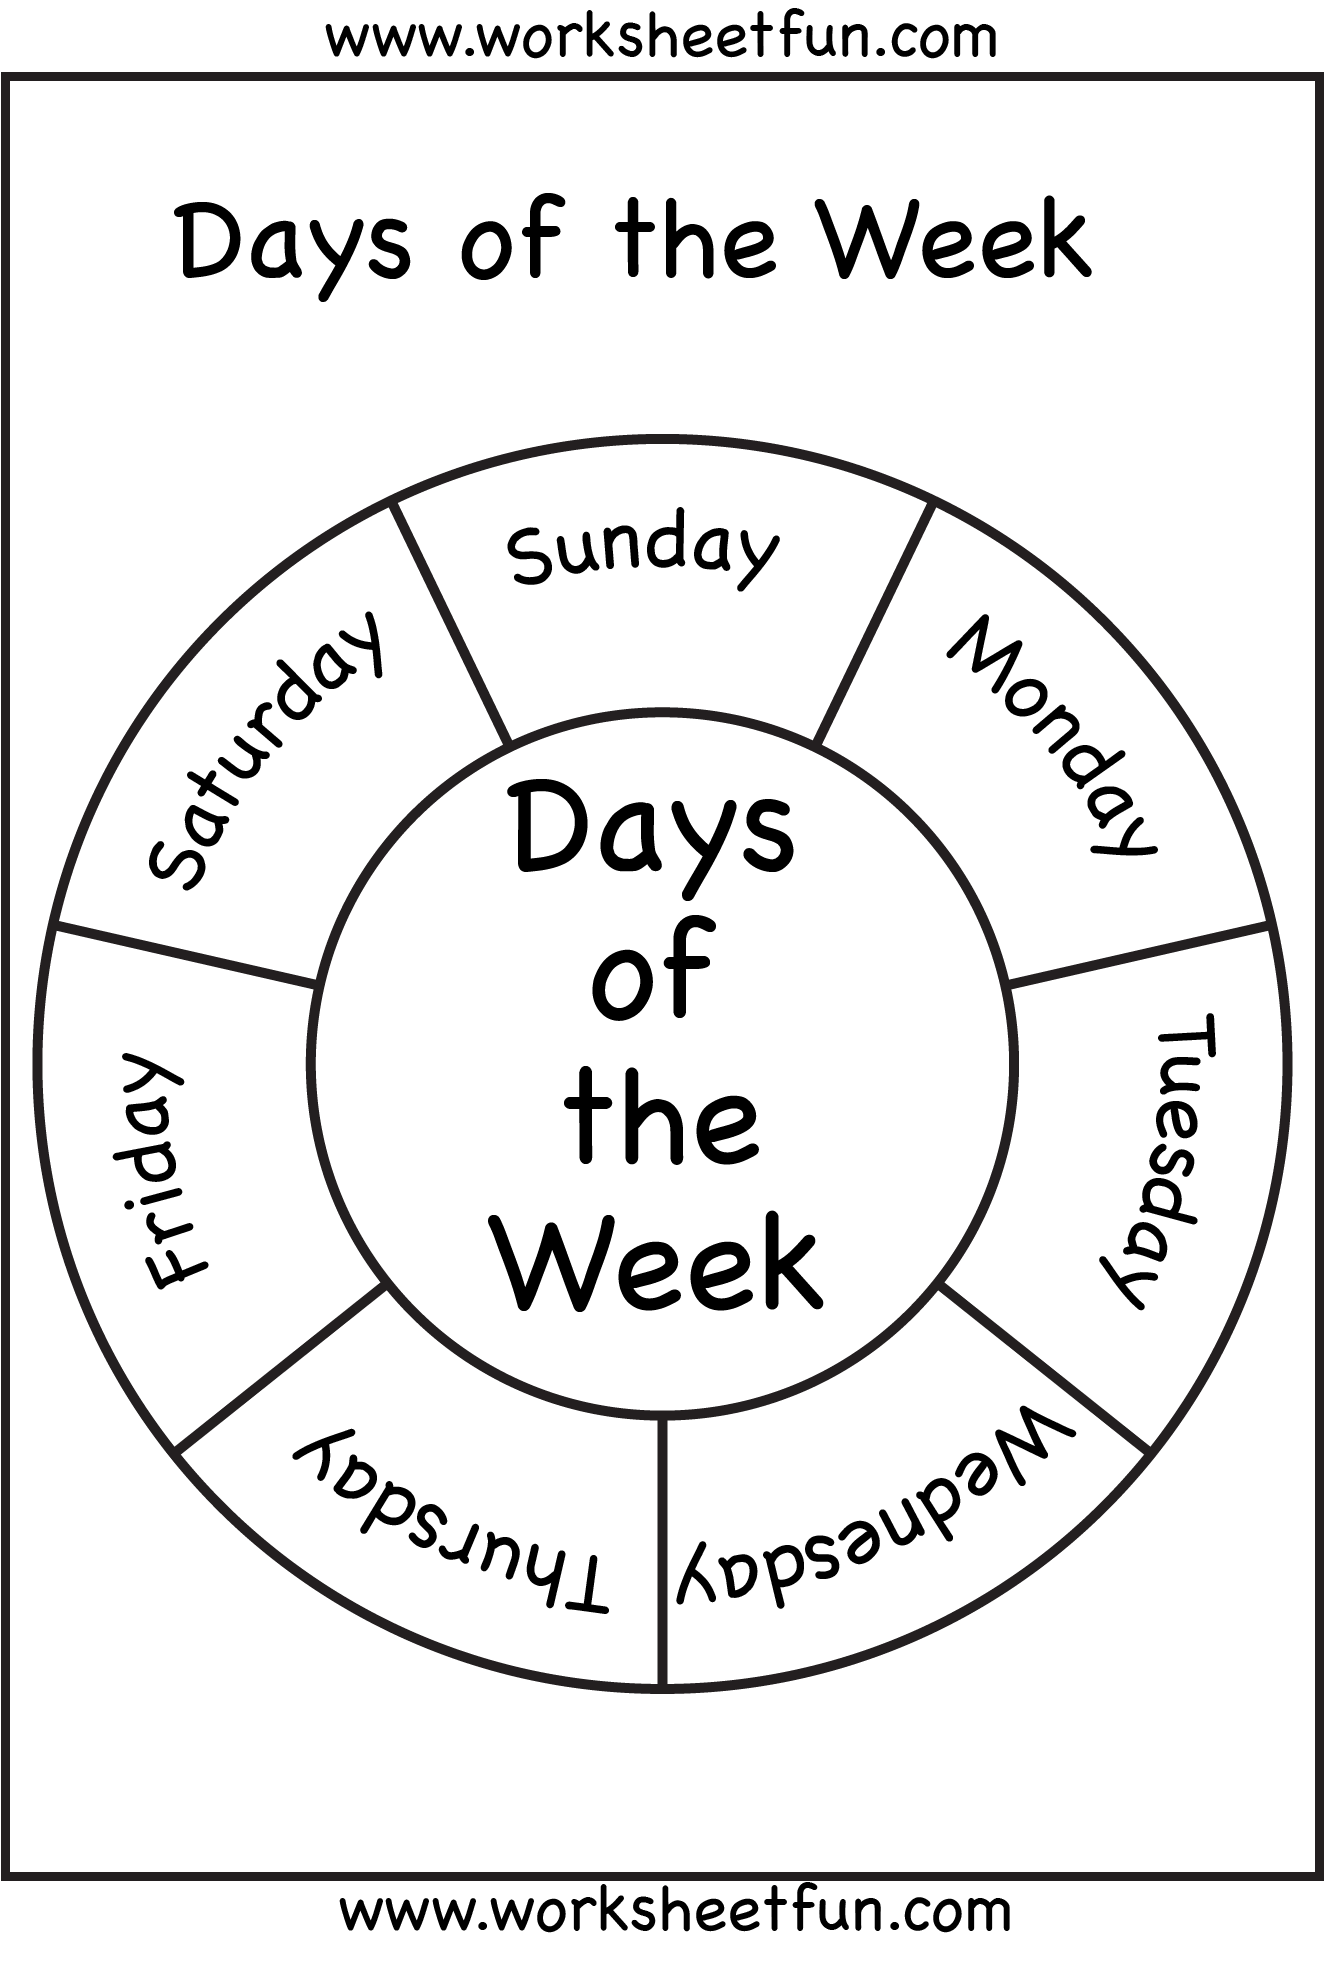 Days Of The Week Free Printable Worksheets Worksheetfun